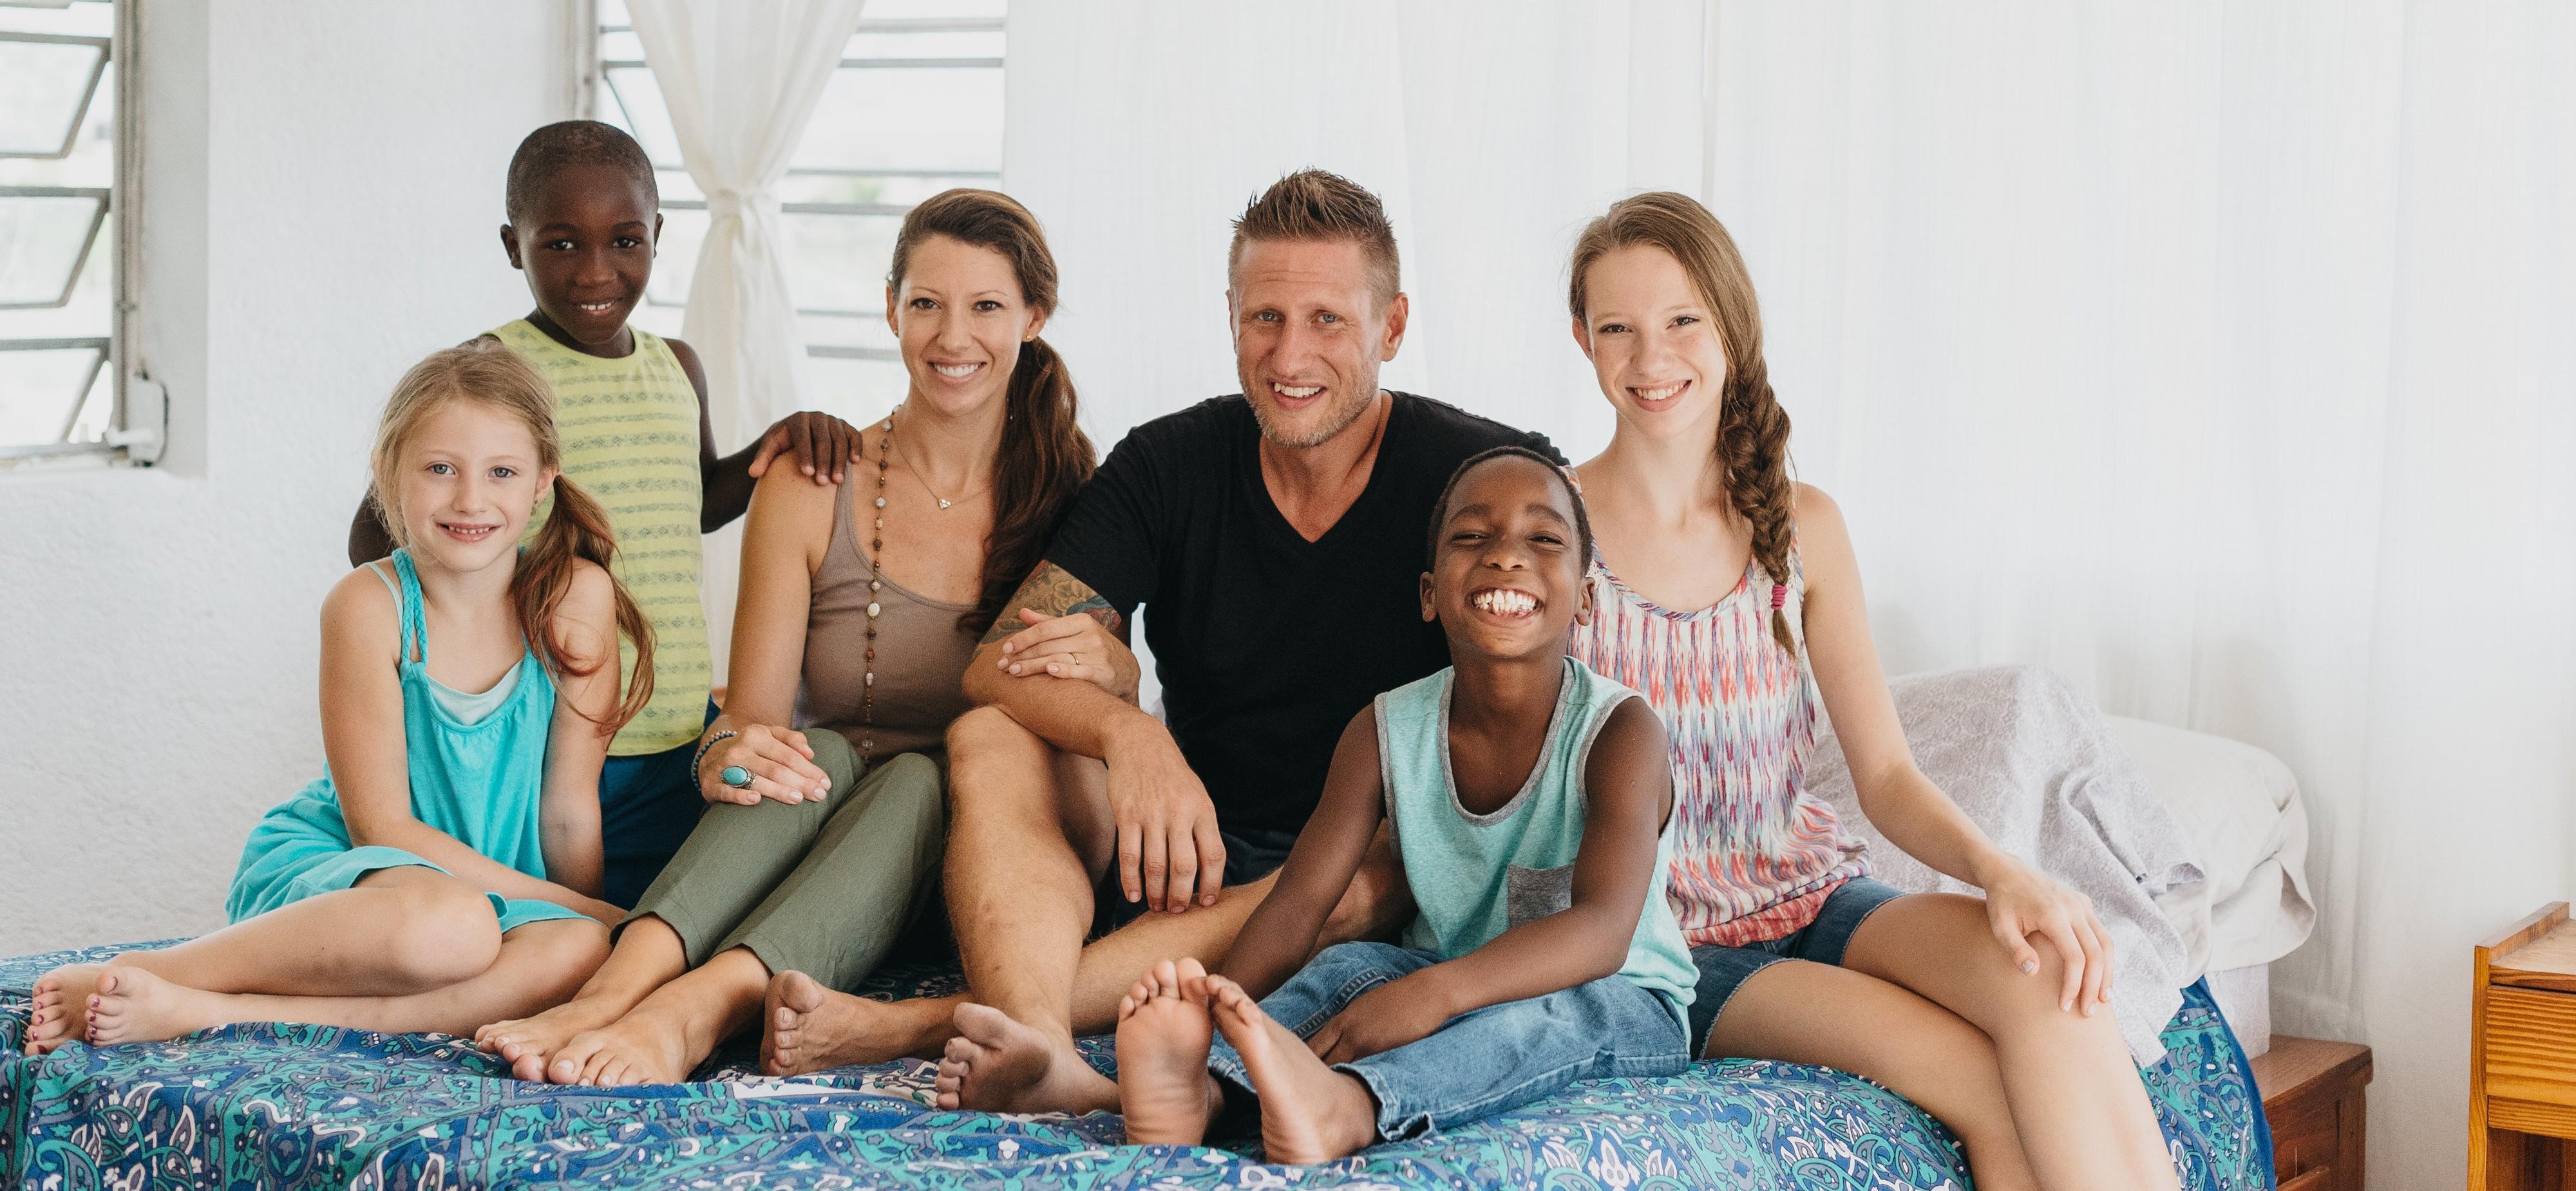 The Pfaff Family